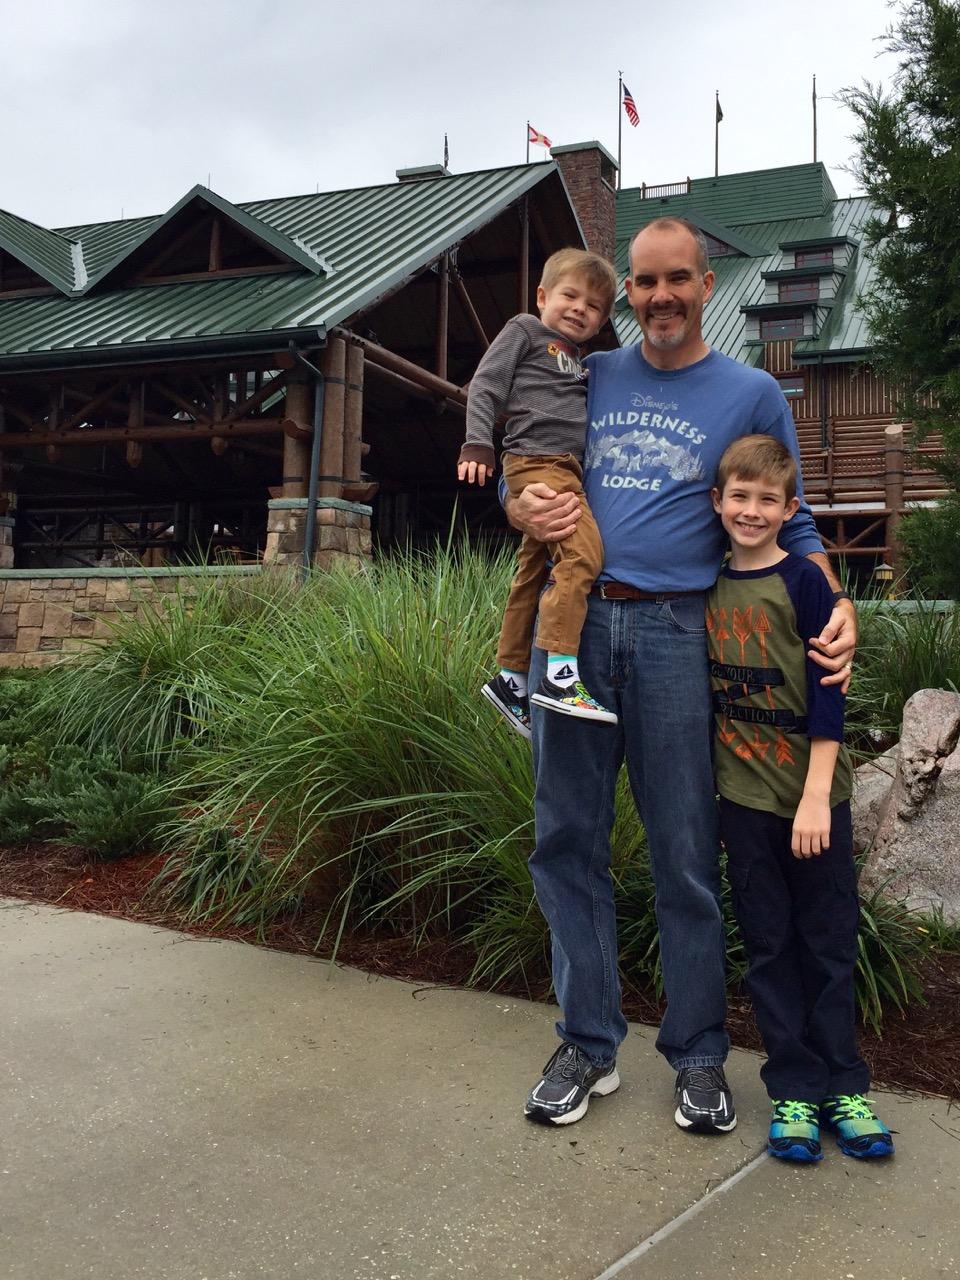 Disney's Wilderness Lodge Check In